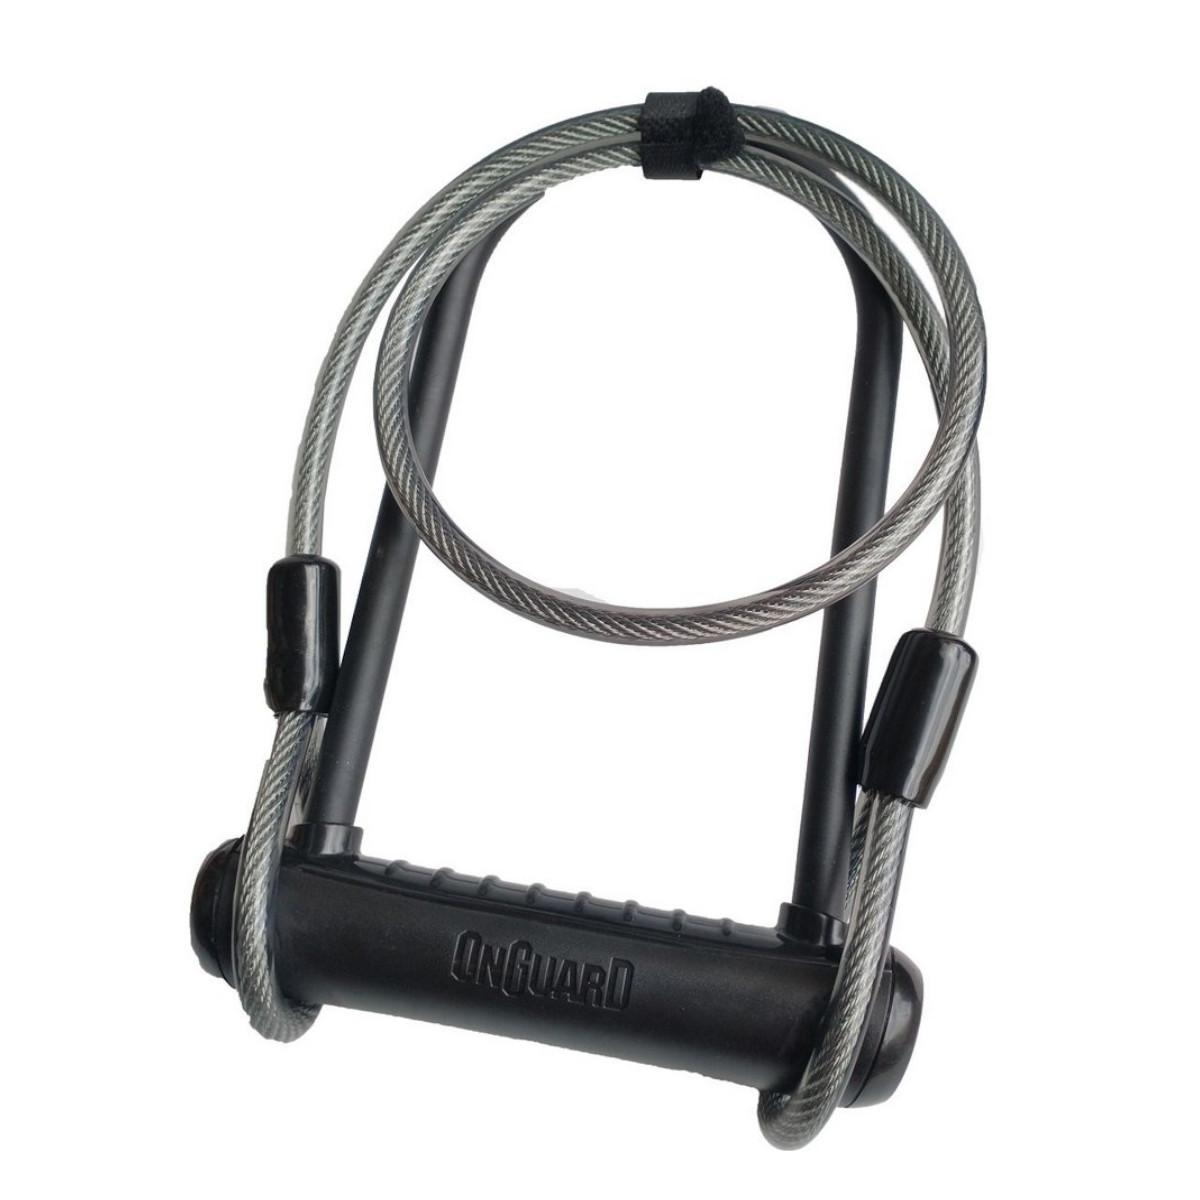 Cadeado Para Bike Onguard Neons 8154 115x230mm